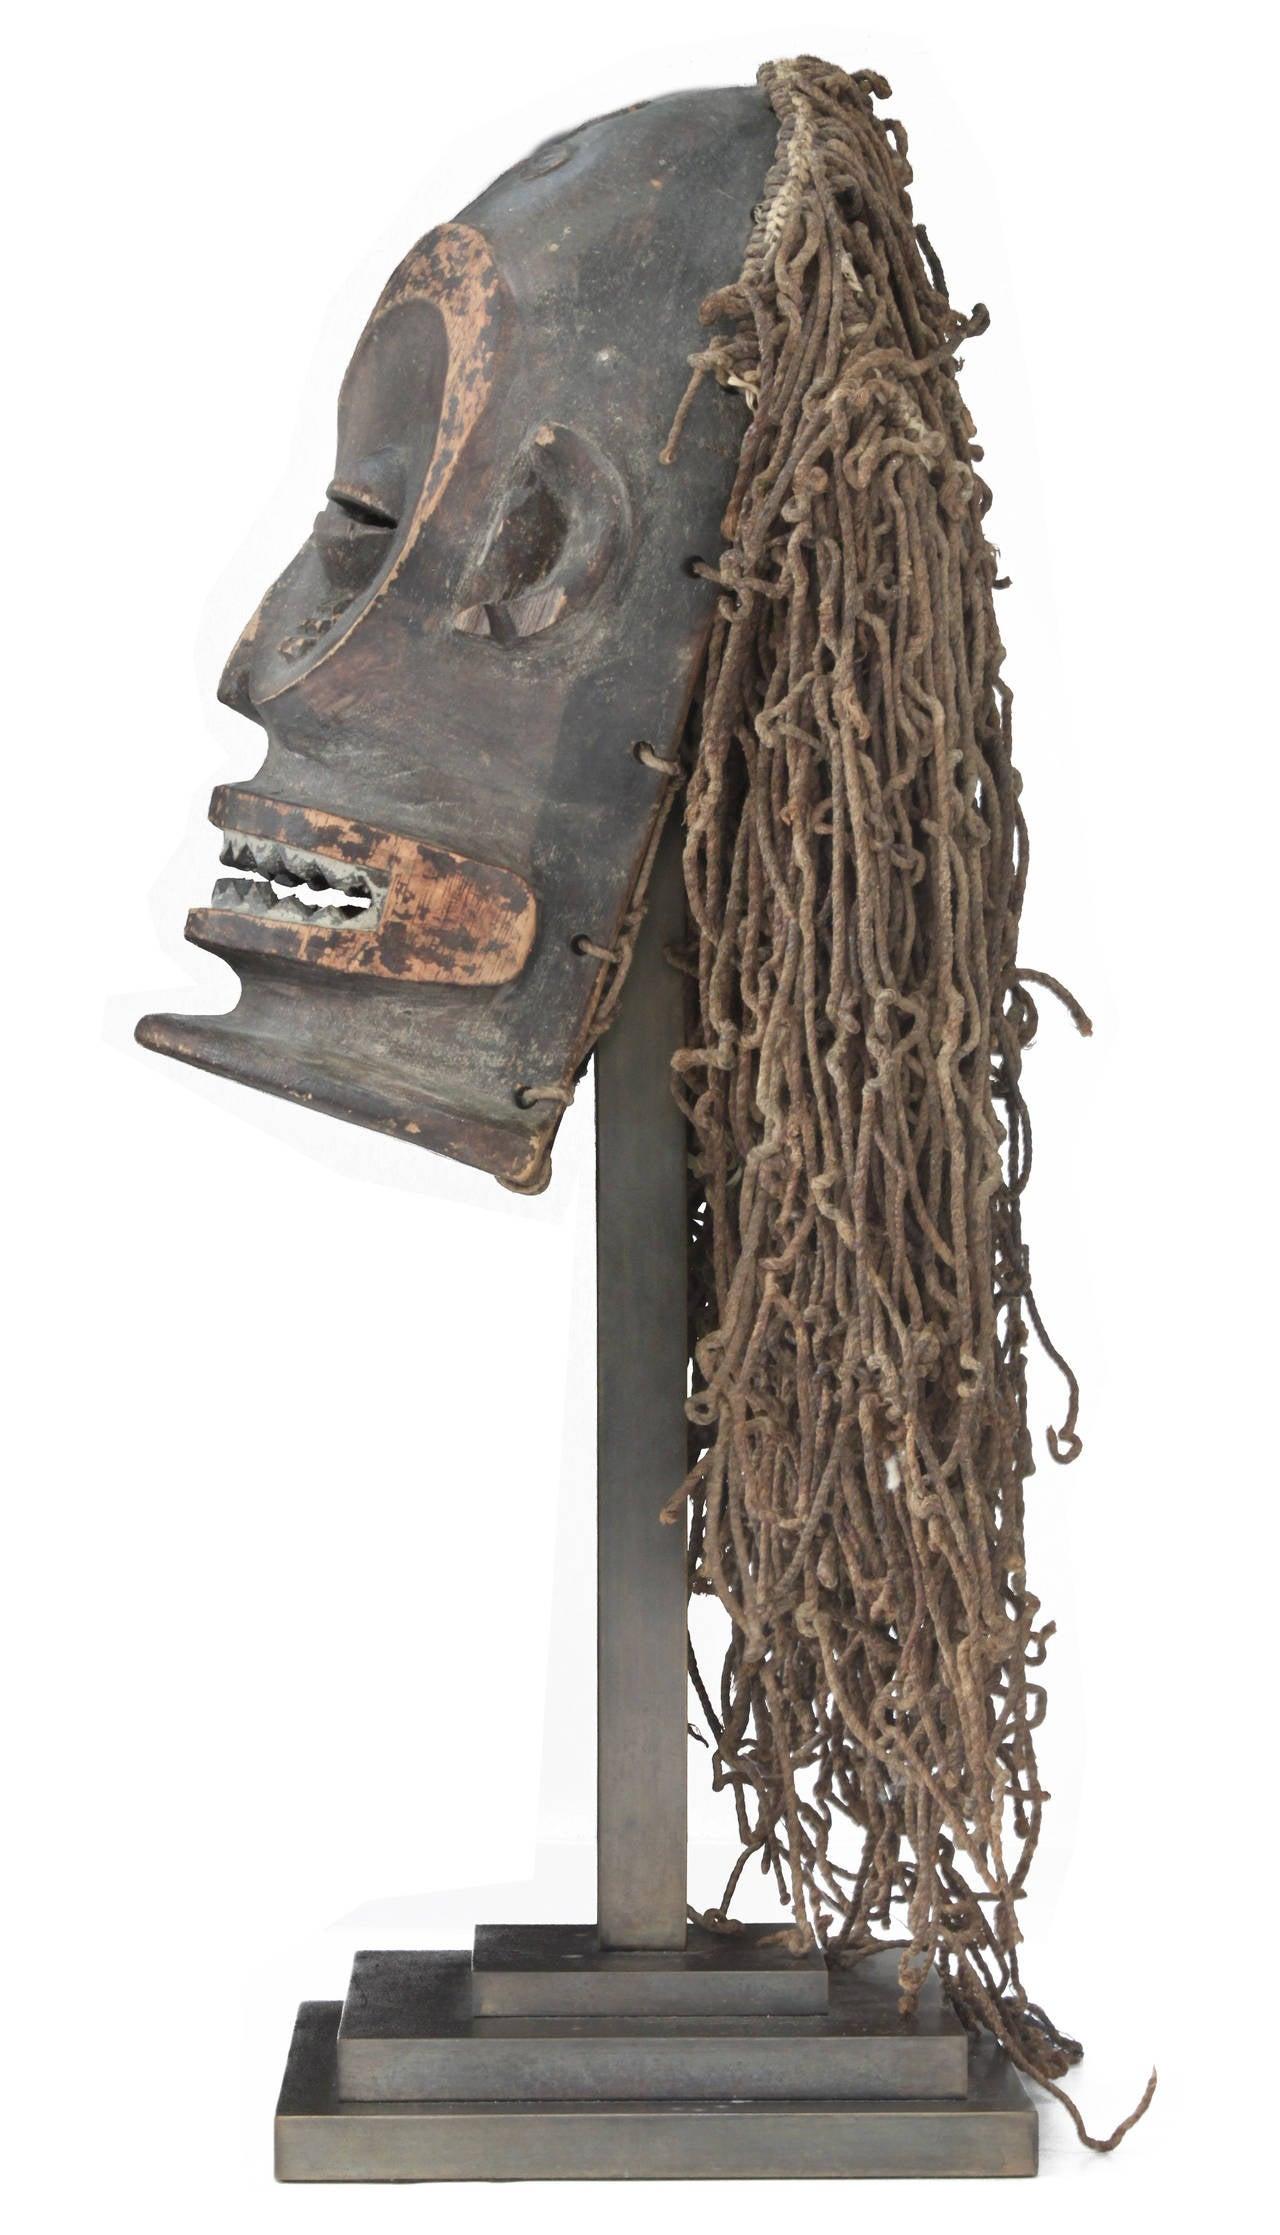 Mid-Century Modern Hand-Carved African Mask on Bronze Base by Karl Springer For Sale